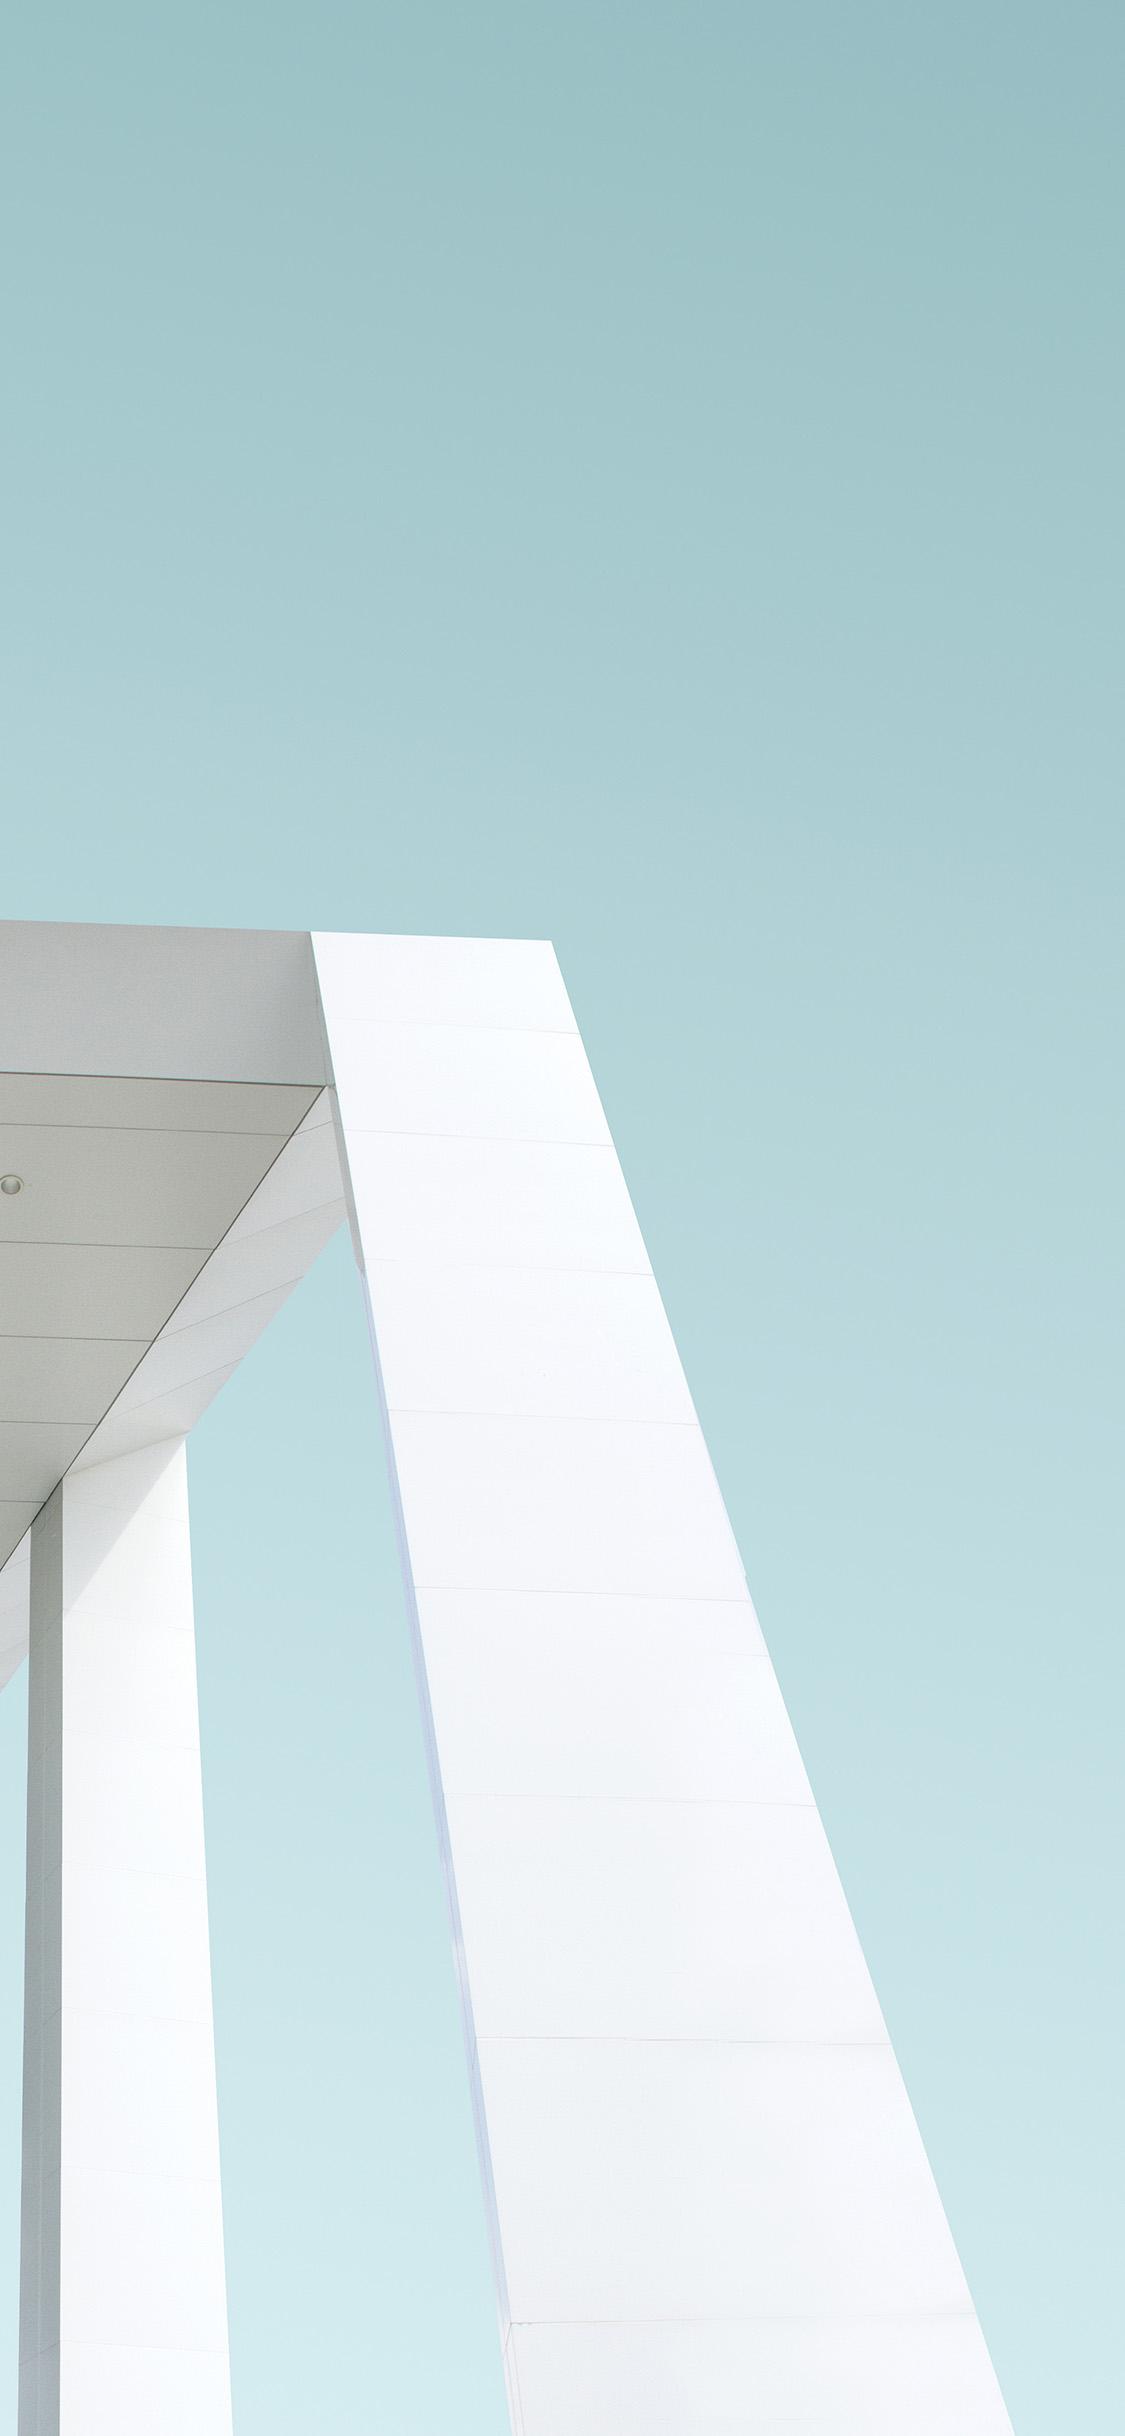 iPhoneXpapers.com-Apple-iPhone-wallpaper-vx94-simple-architecture-blue-pattern-background